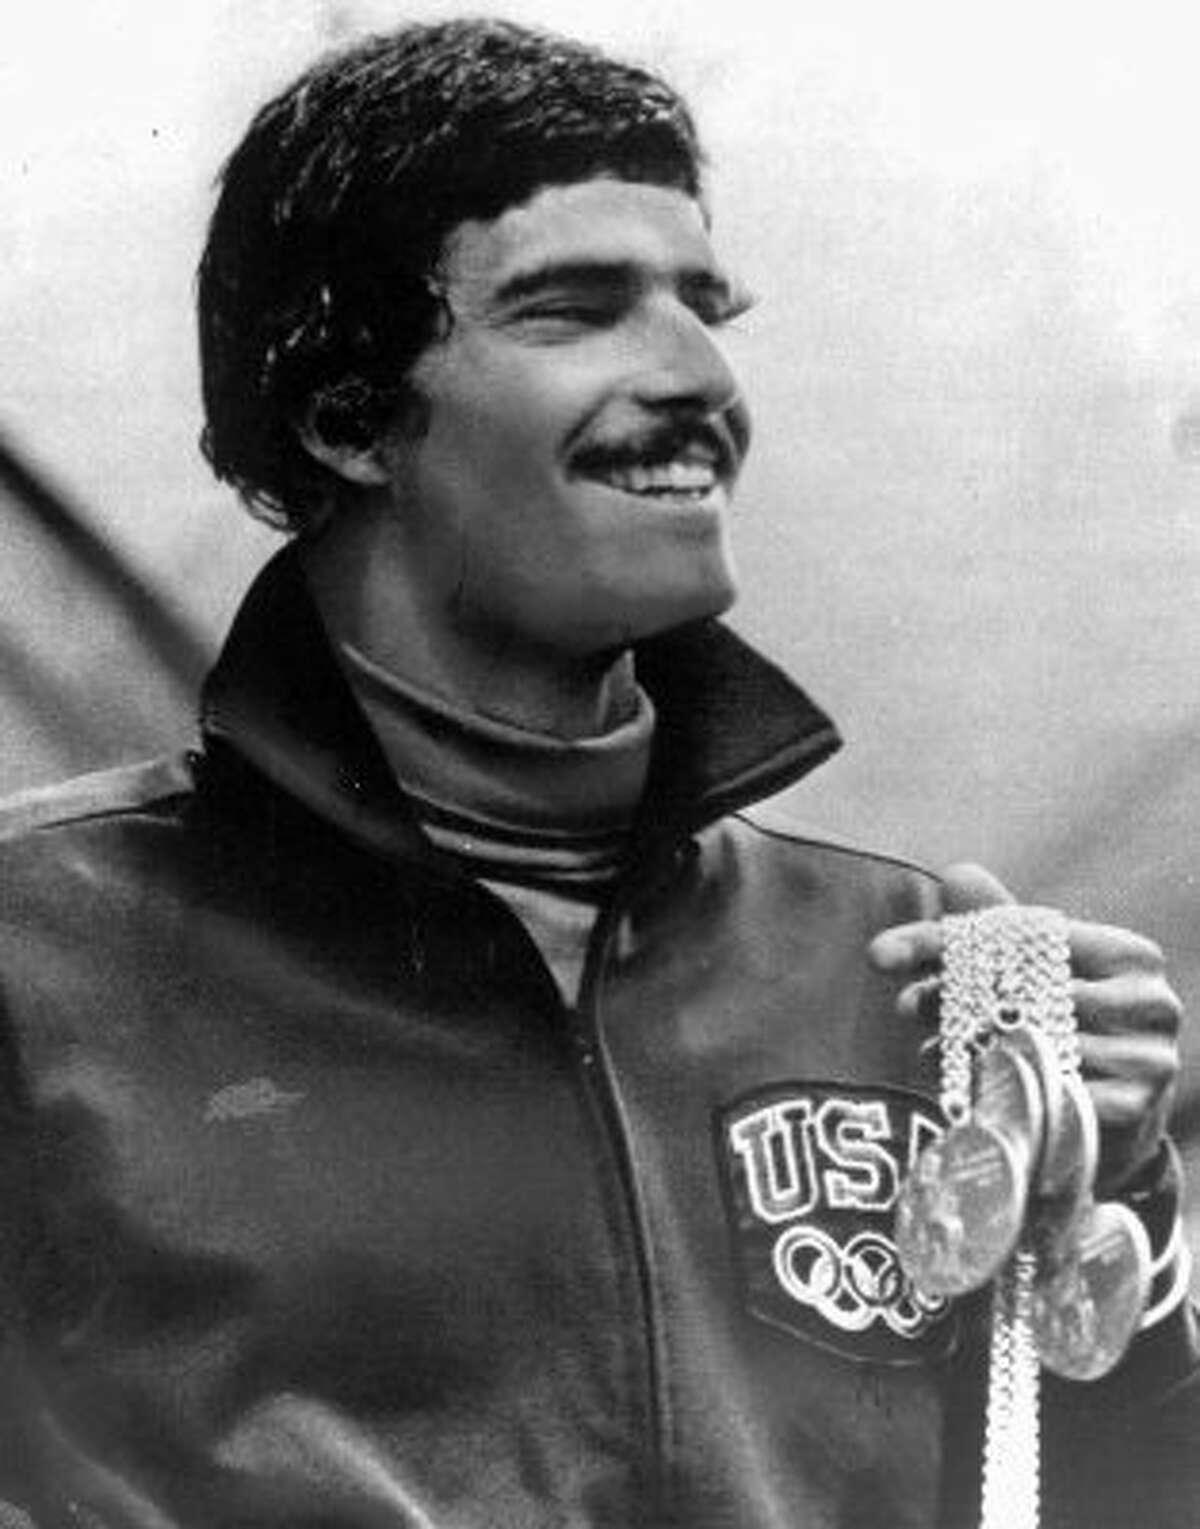 Mark Spitz, swimming: The Sacramento and Santa Clara native won nine gold medals from 1968-1972.